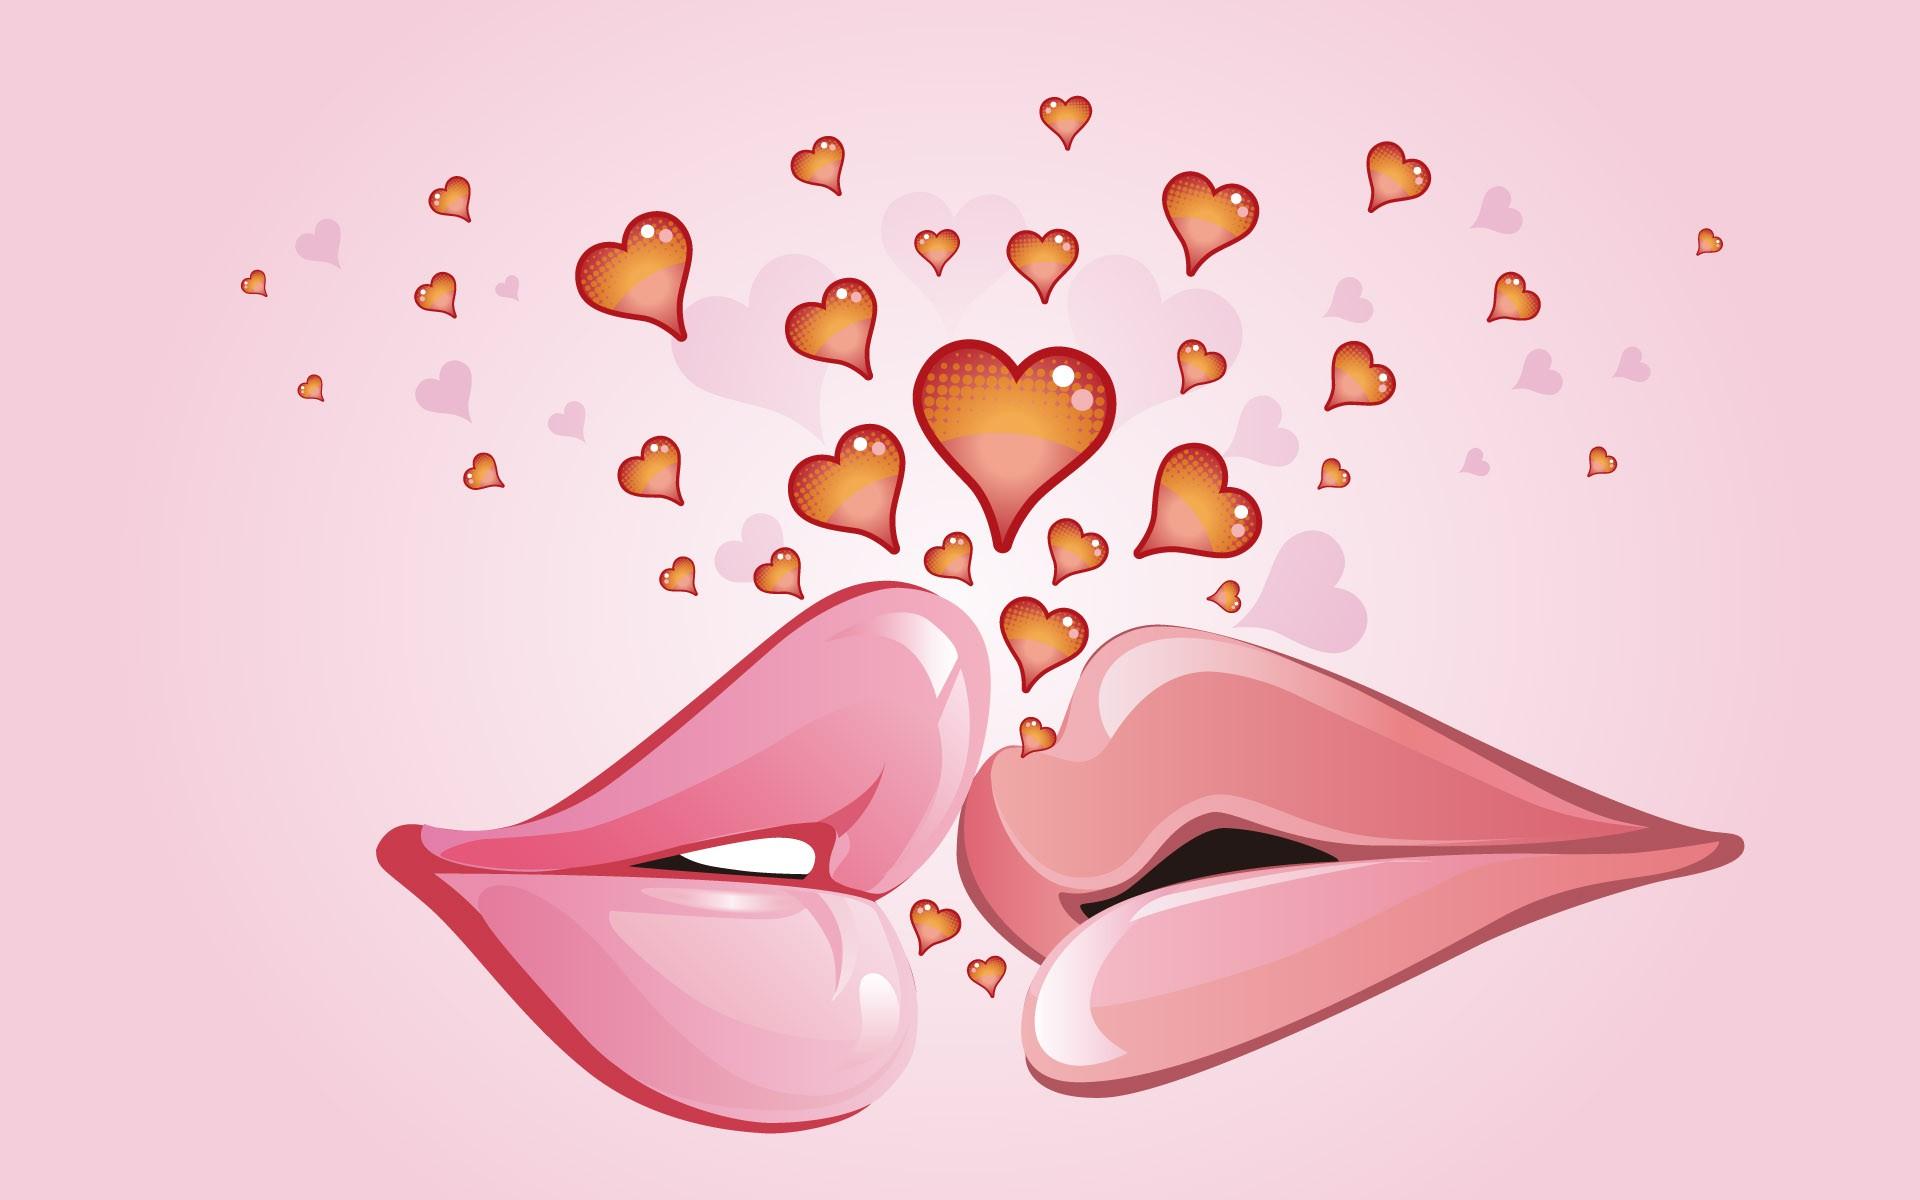 44+] Wallpaper Kissing Lips on WallpaperSafari